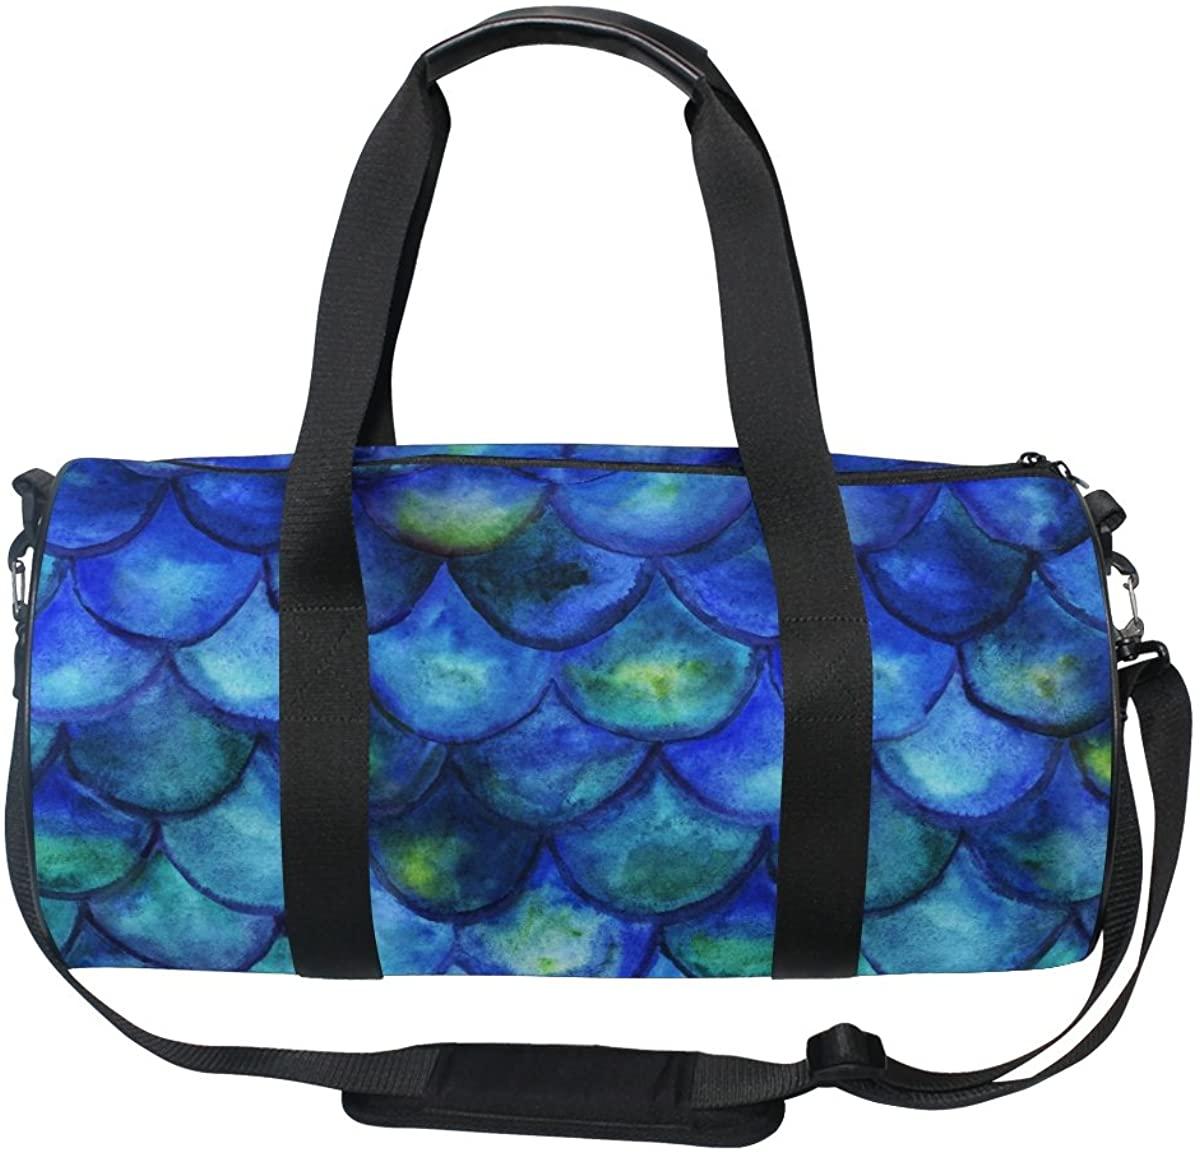 ALAZA Vintage Blue Mermaid Tale Sports Gym Duffel Bag Travel Luggage Handbag for Men Women